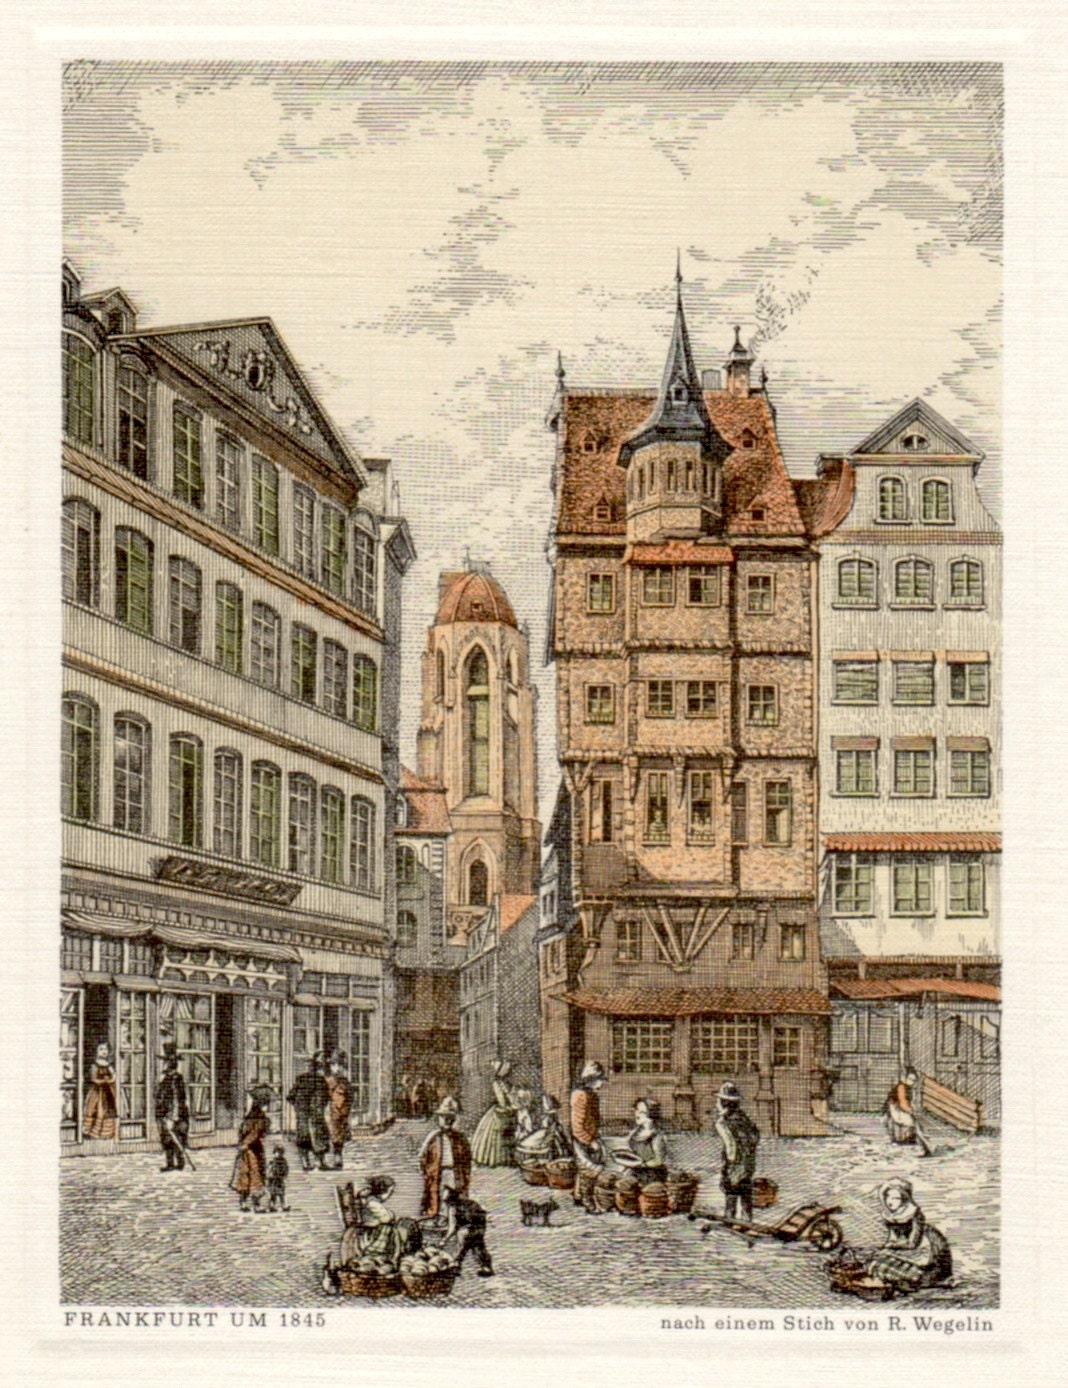 Frankfurt in 1845 Germany Antique Lithograph Vintage Print